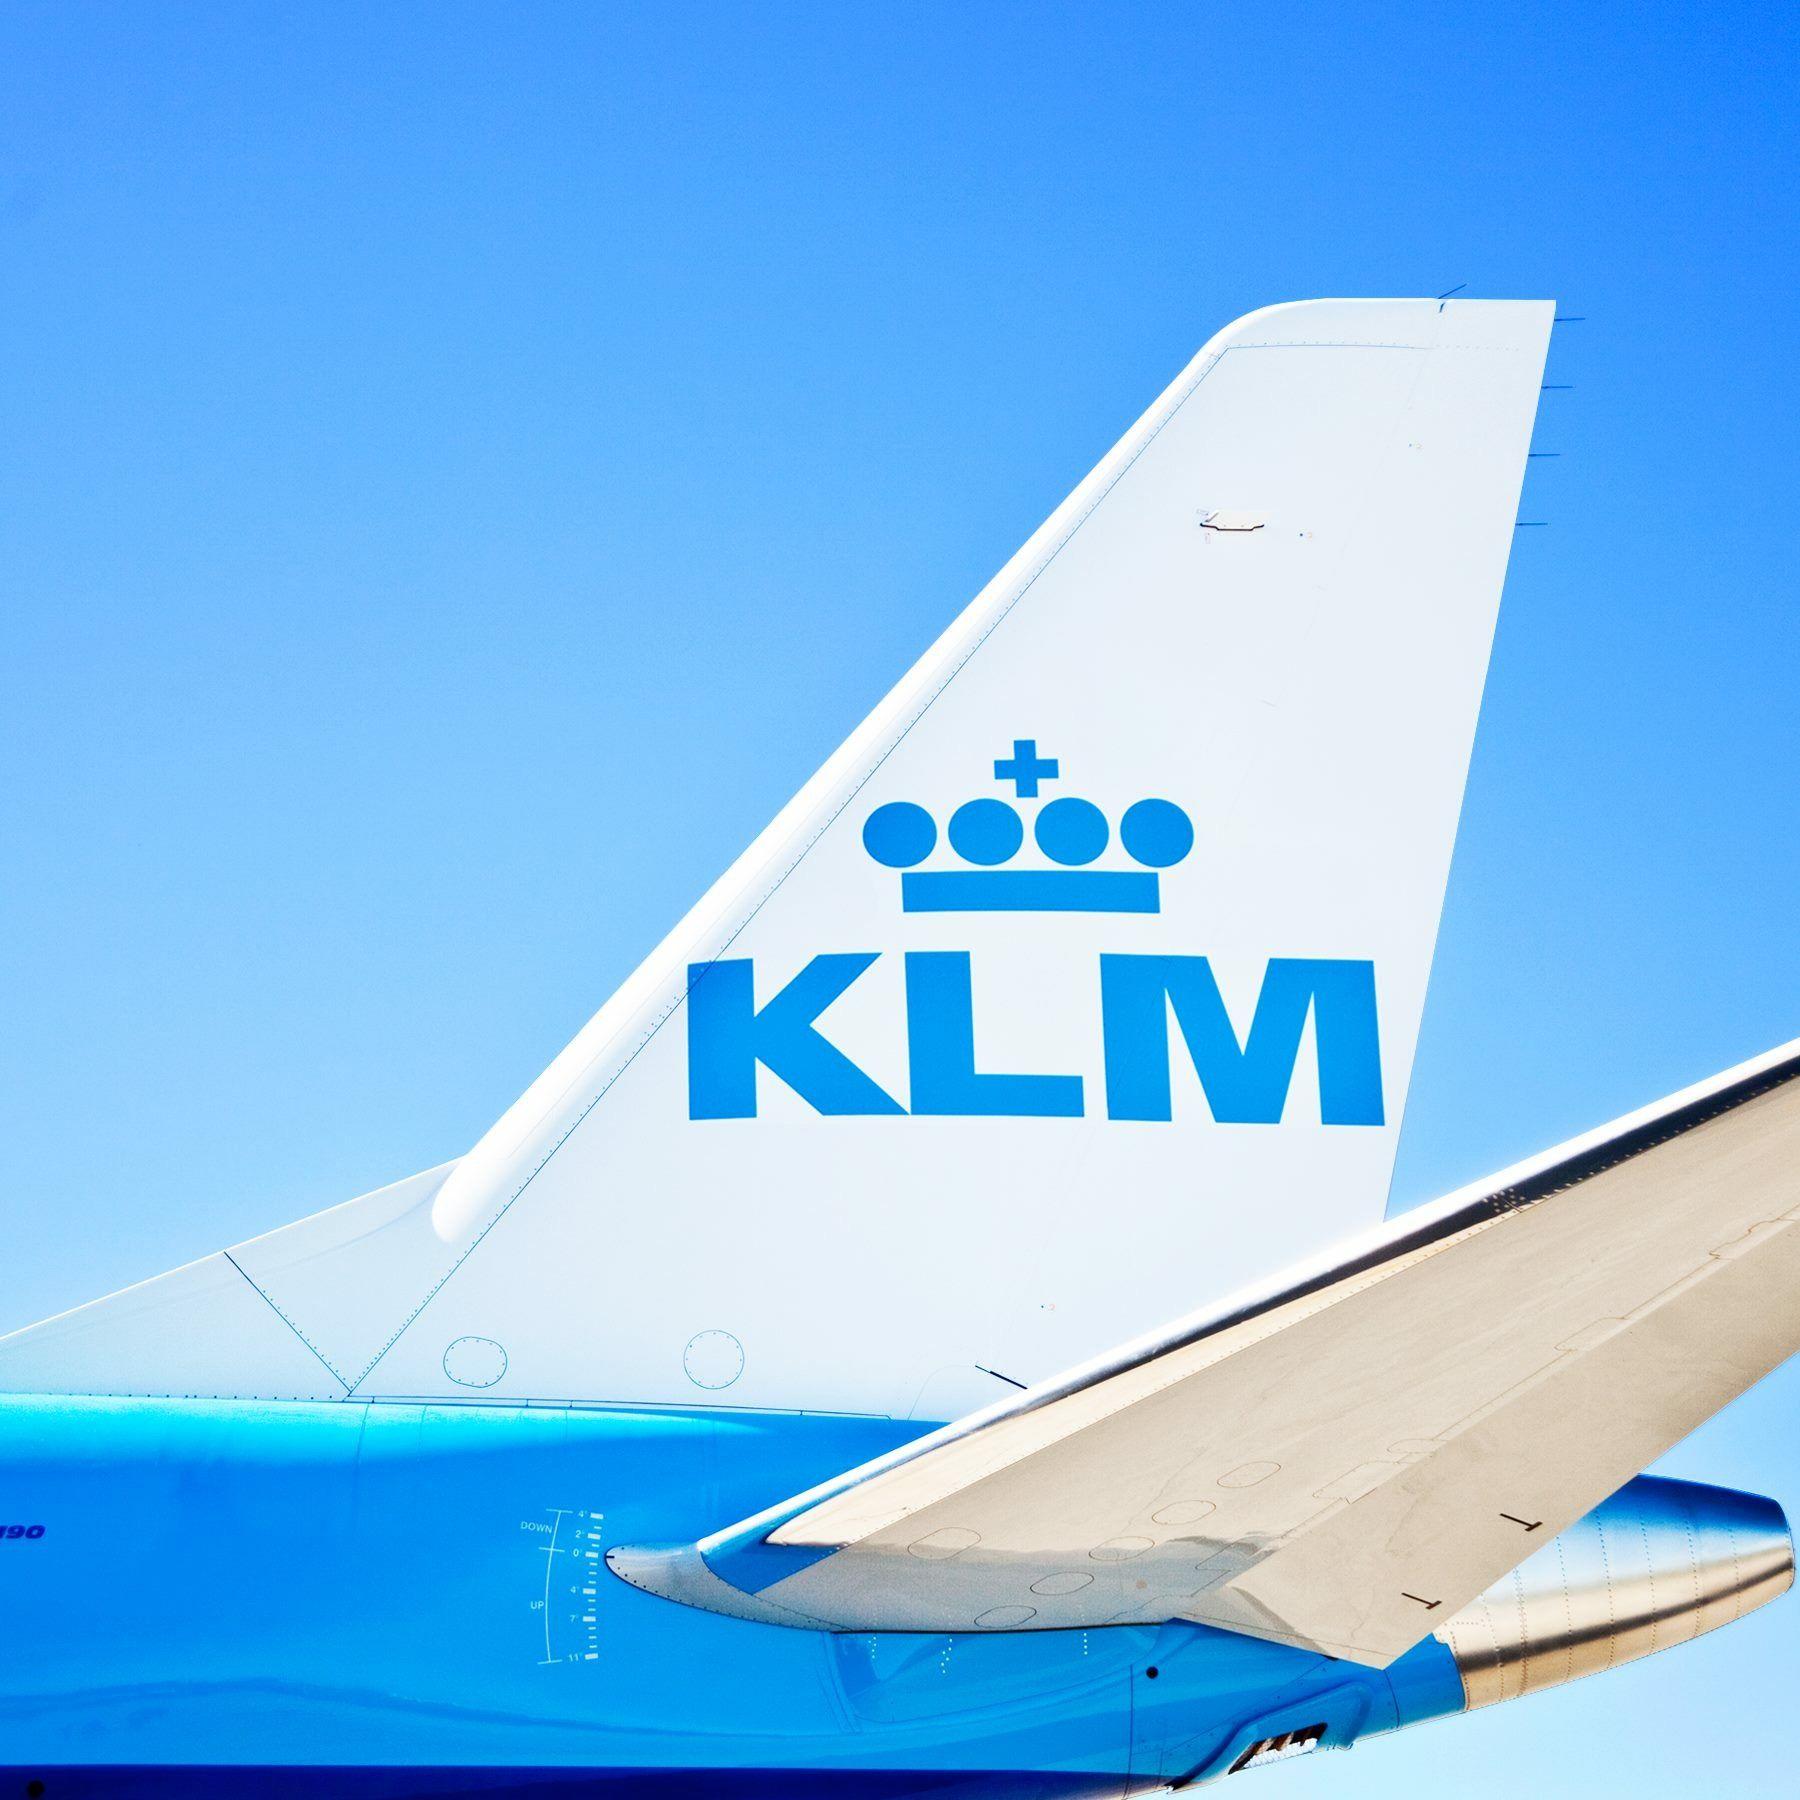 Pin van Eugèn Bruggeman op Airlines Vliegtuig, Nederland